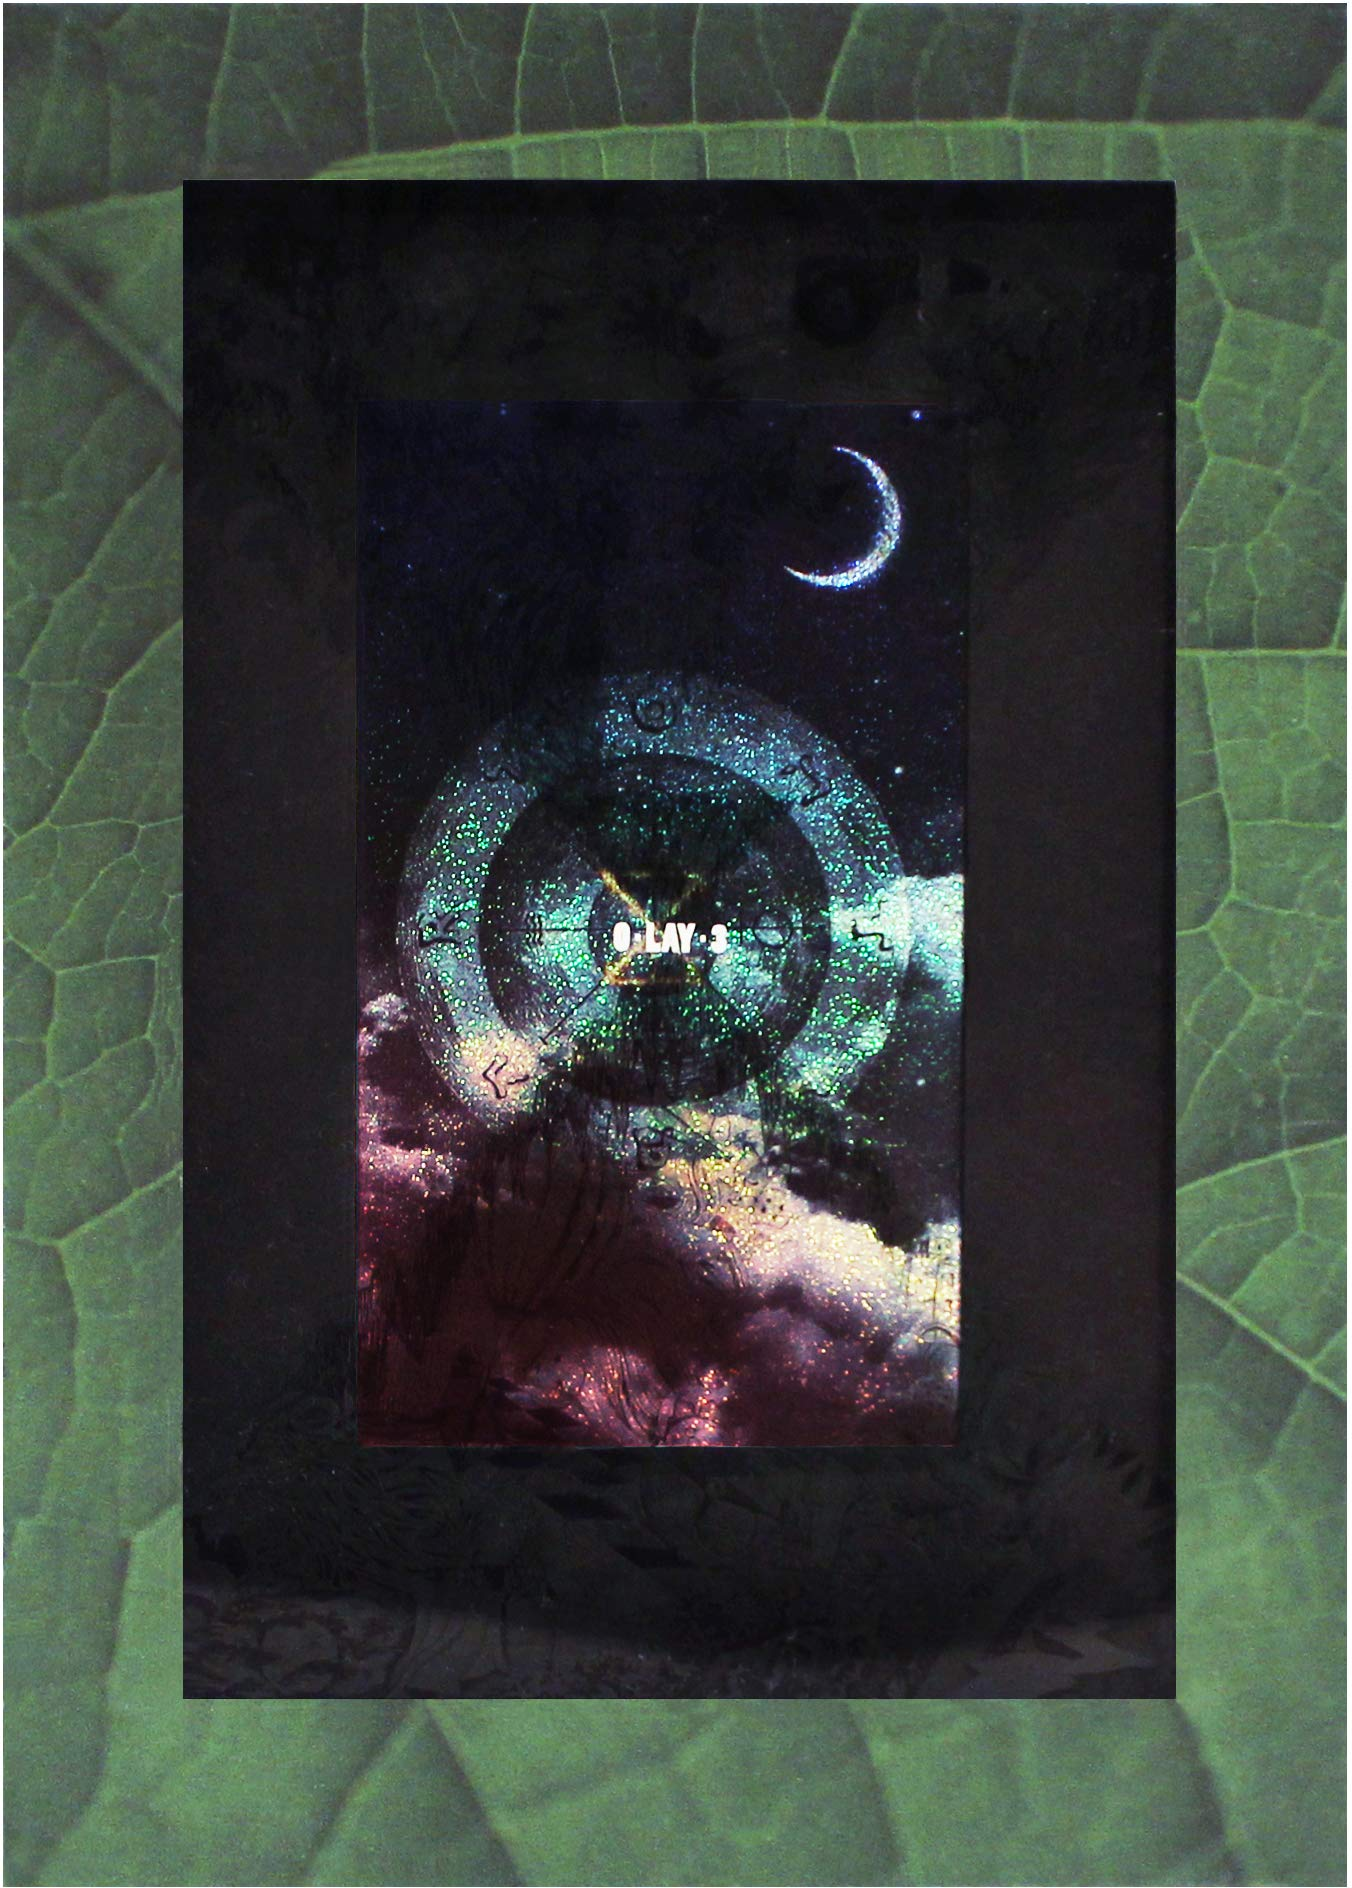 Lay the 3rd Album (Namanana)